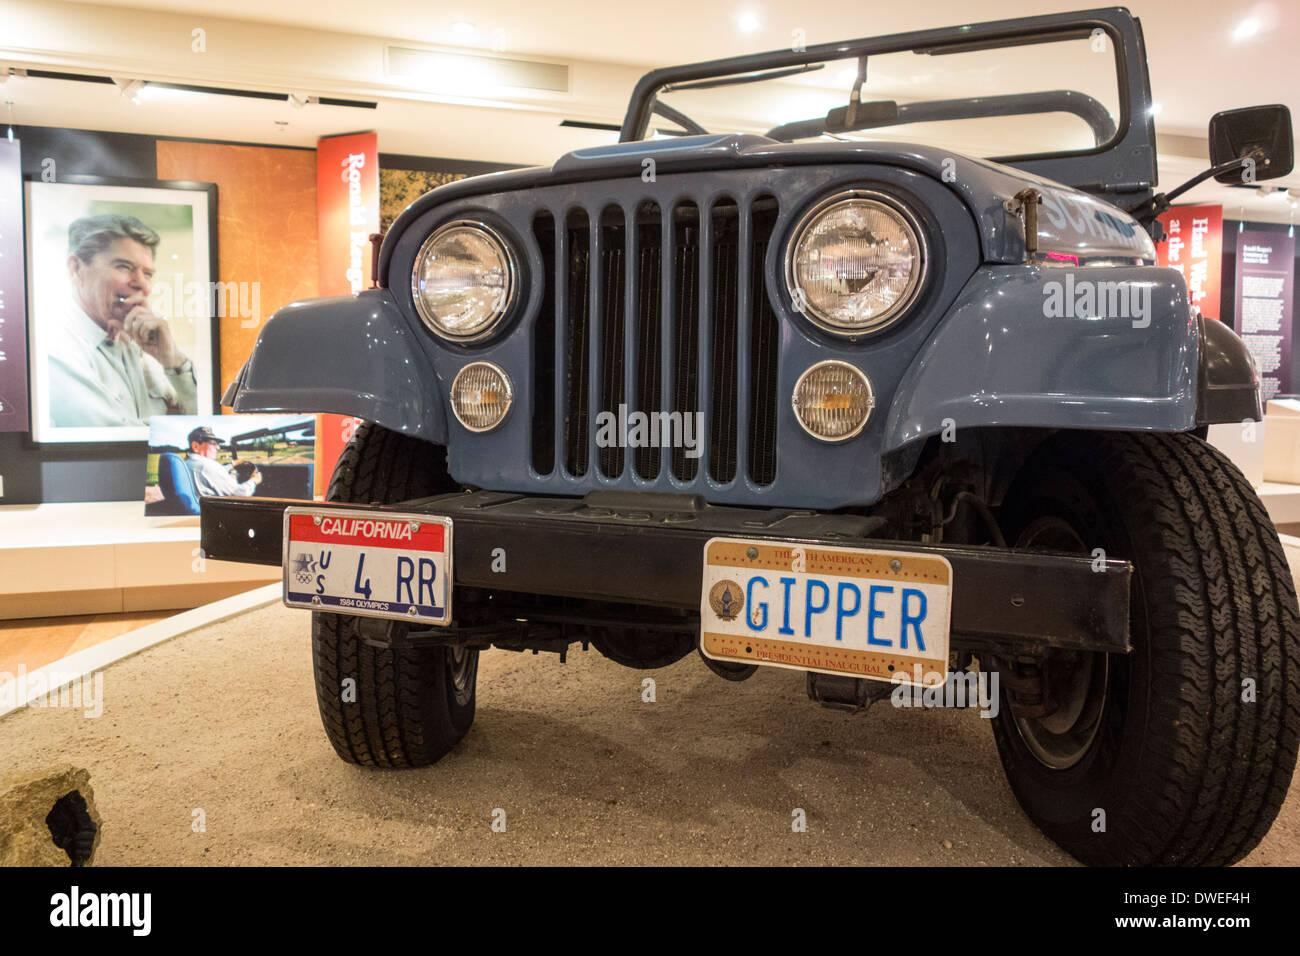 jeep of former US President Ronald Reagan displayed at Ronald Reagan Ranch Center museum in Santa Barbara California - Stock Image